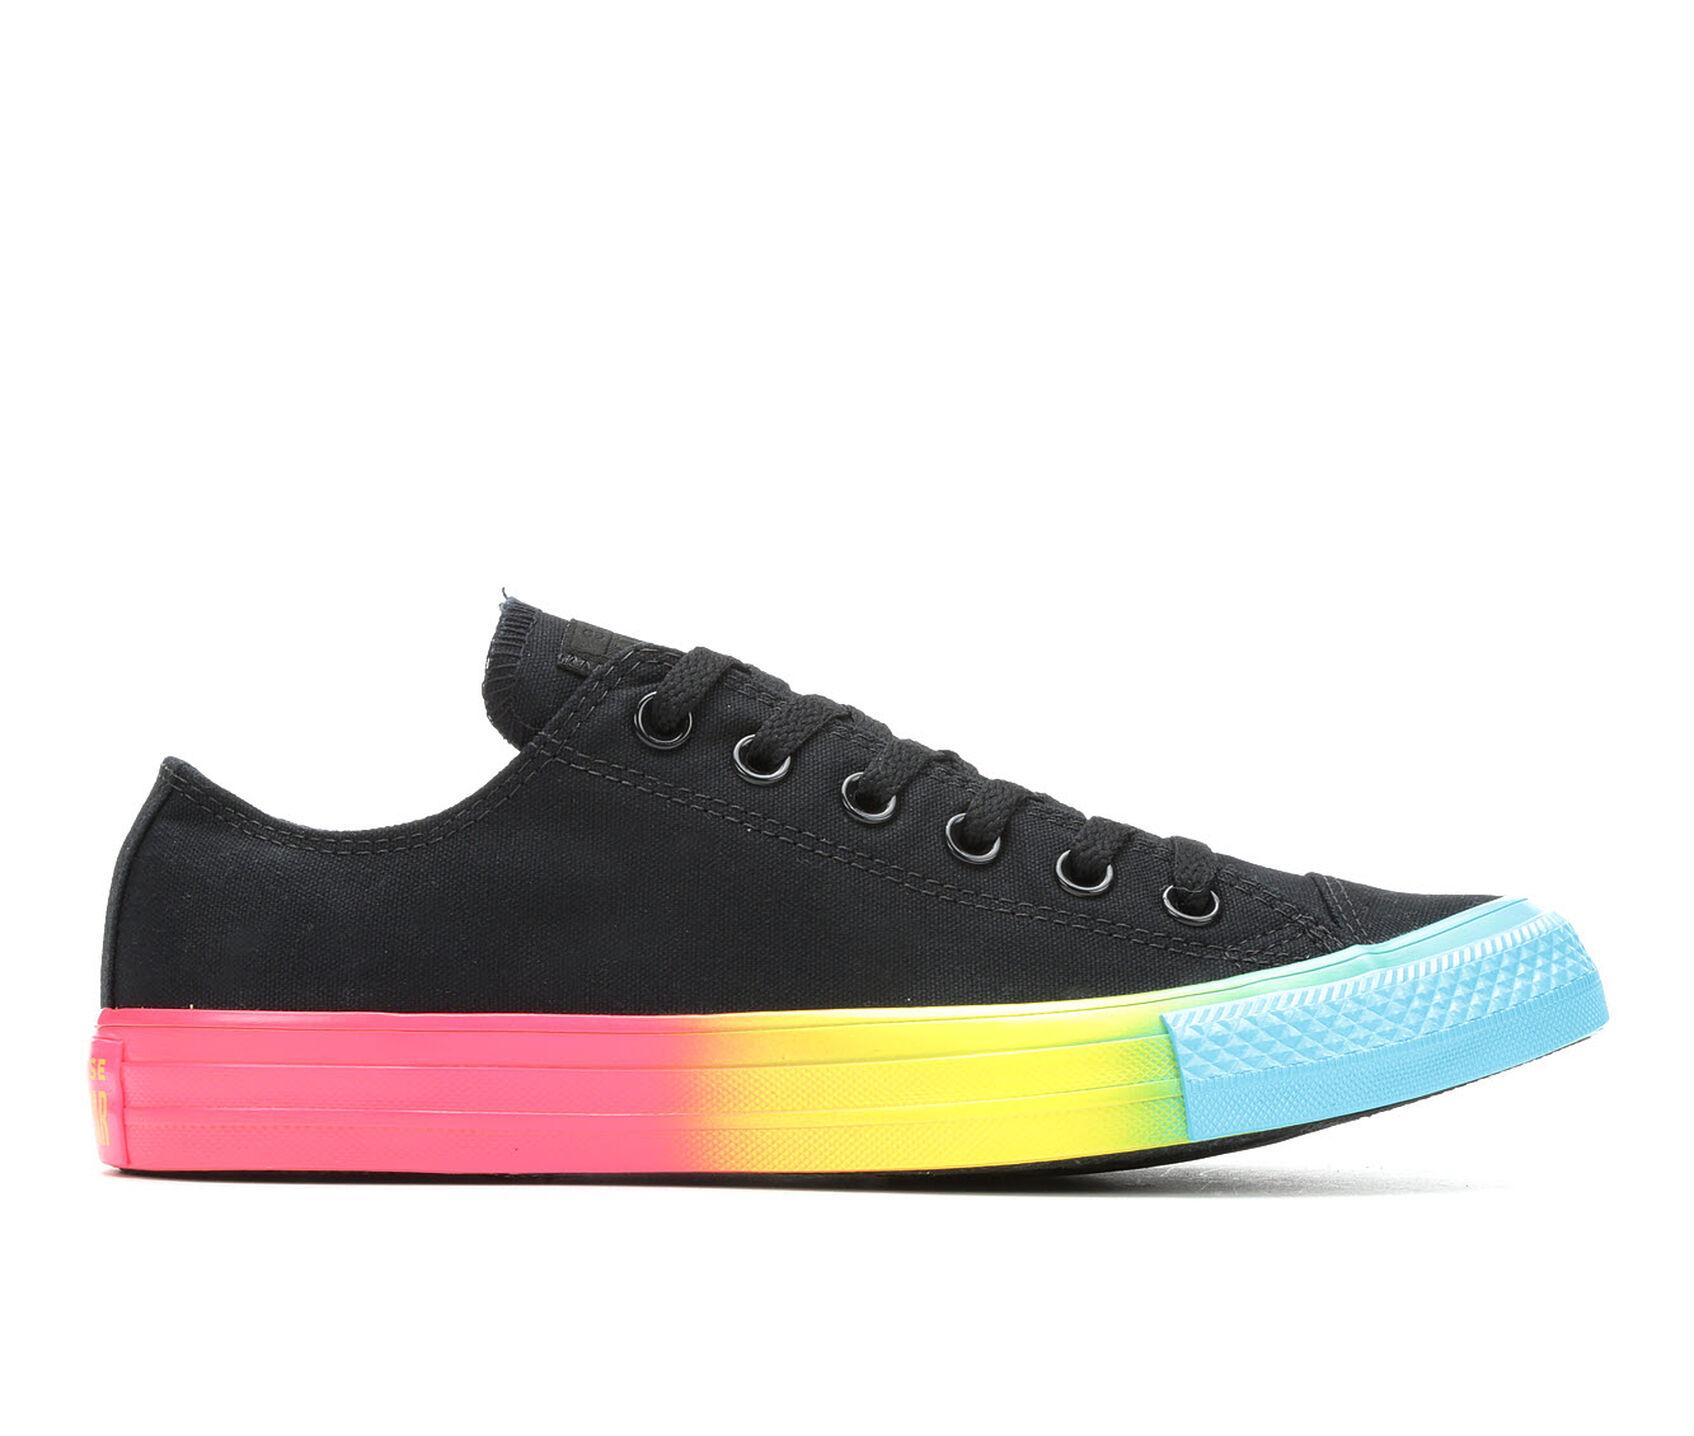 dca52bd50e Men's Converse Chuck Taylor All Star Rainbow Ice Ox Sneakers   Shoe ...